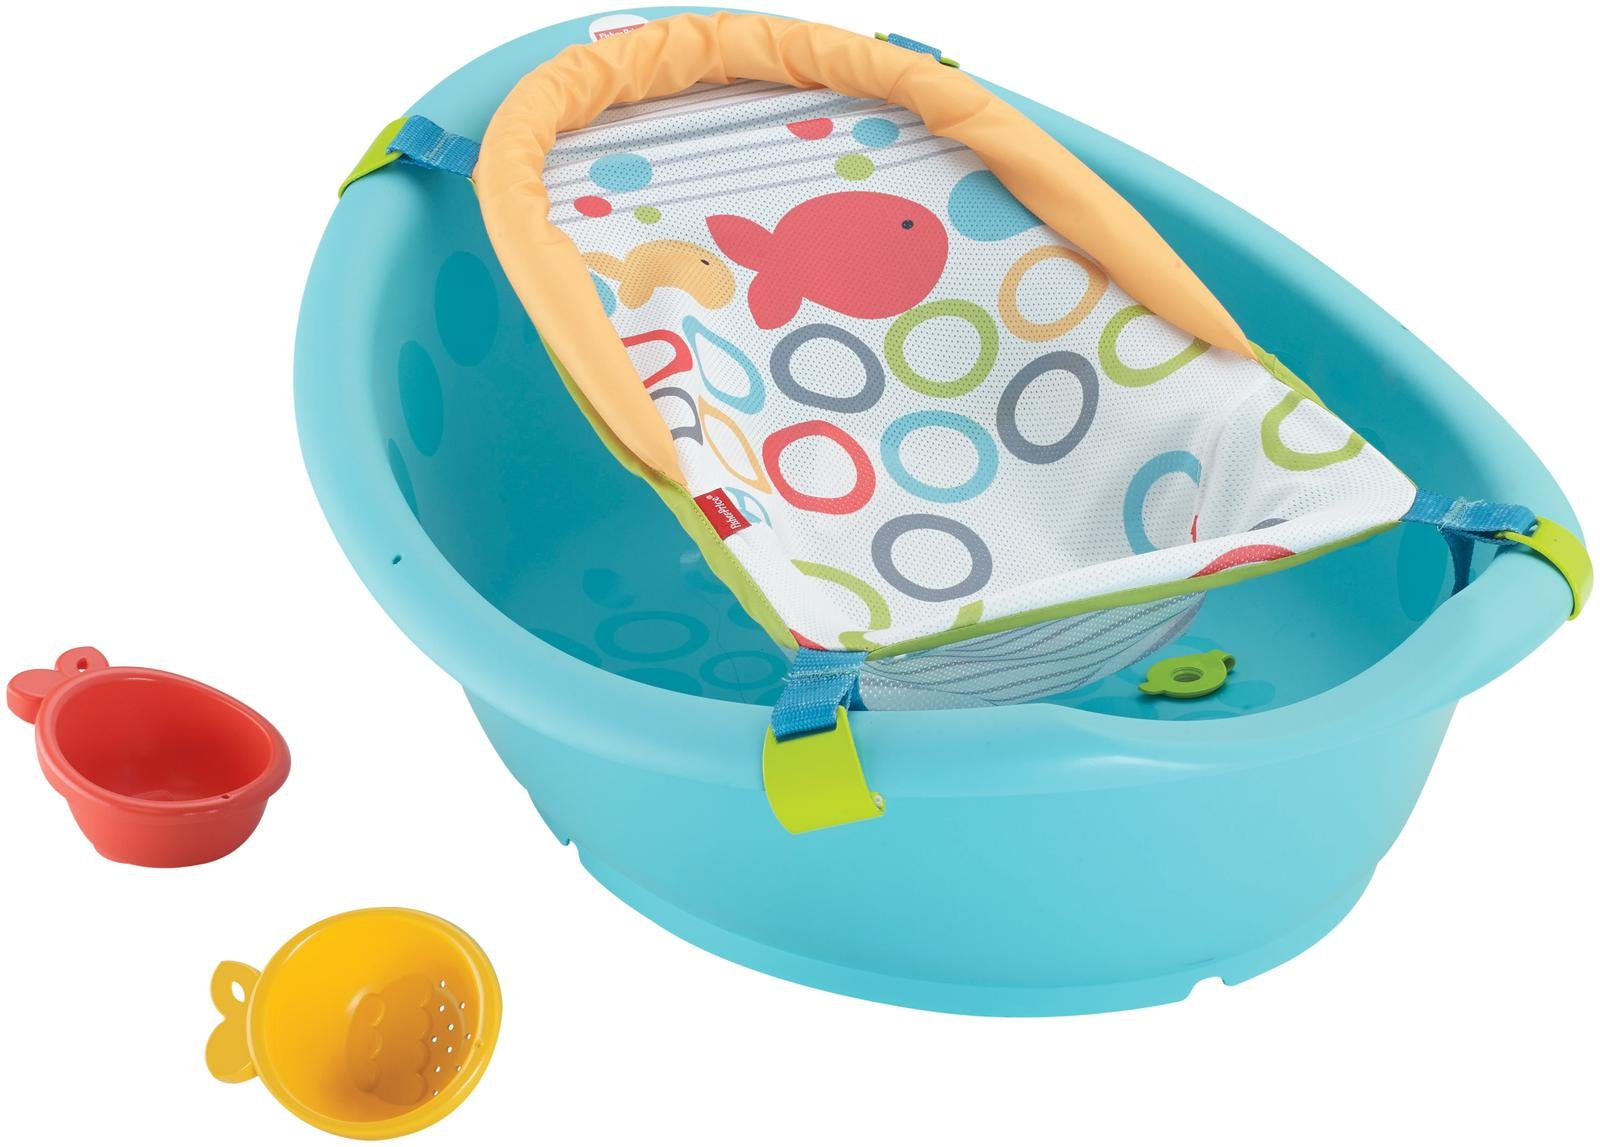 Fisher Price Fisher-Price Rinse N Grow Tub